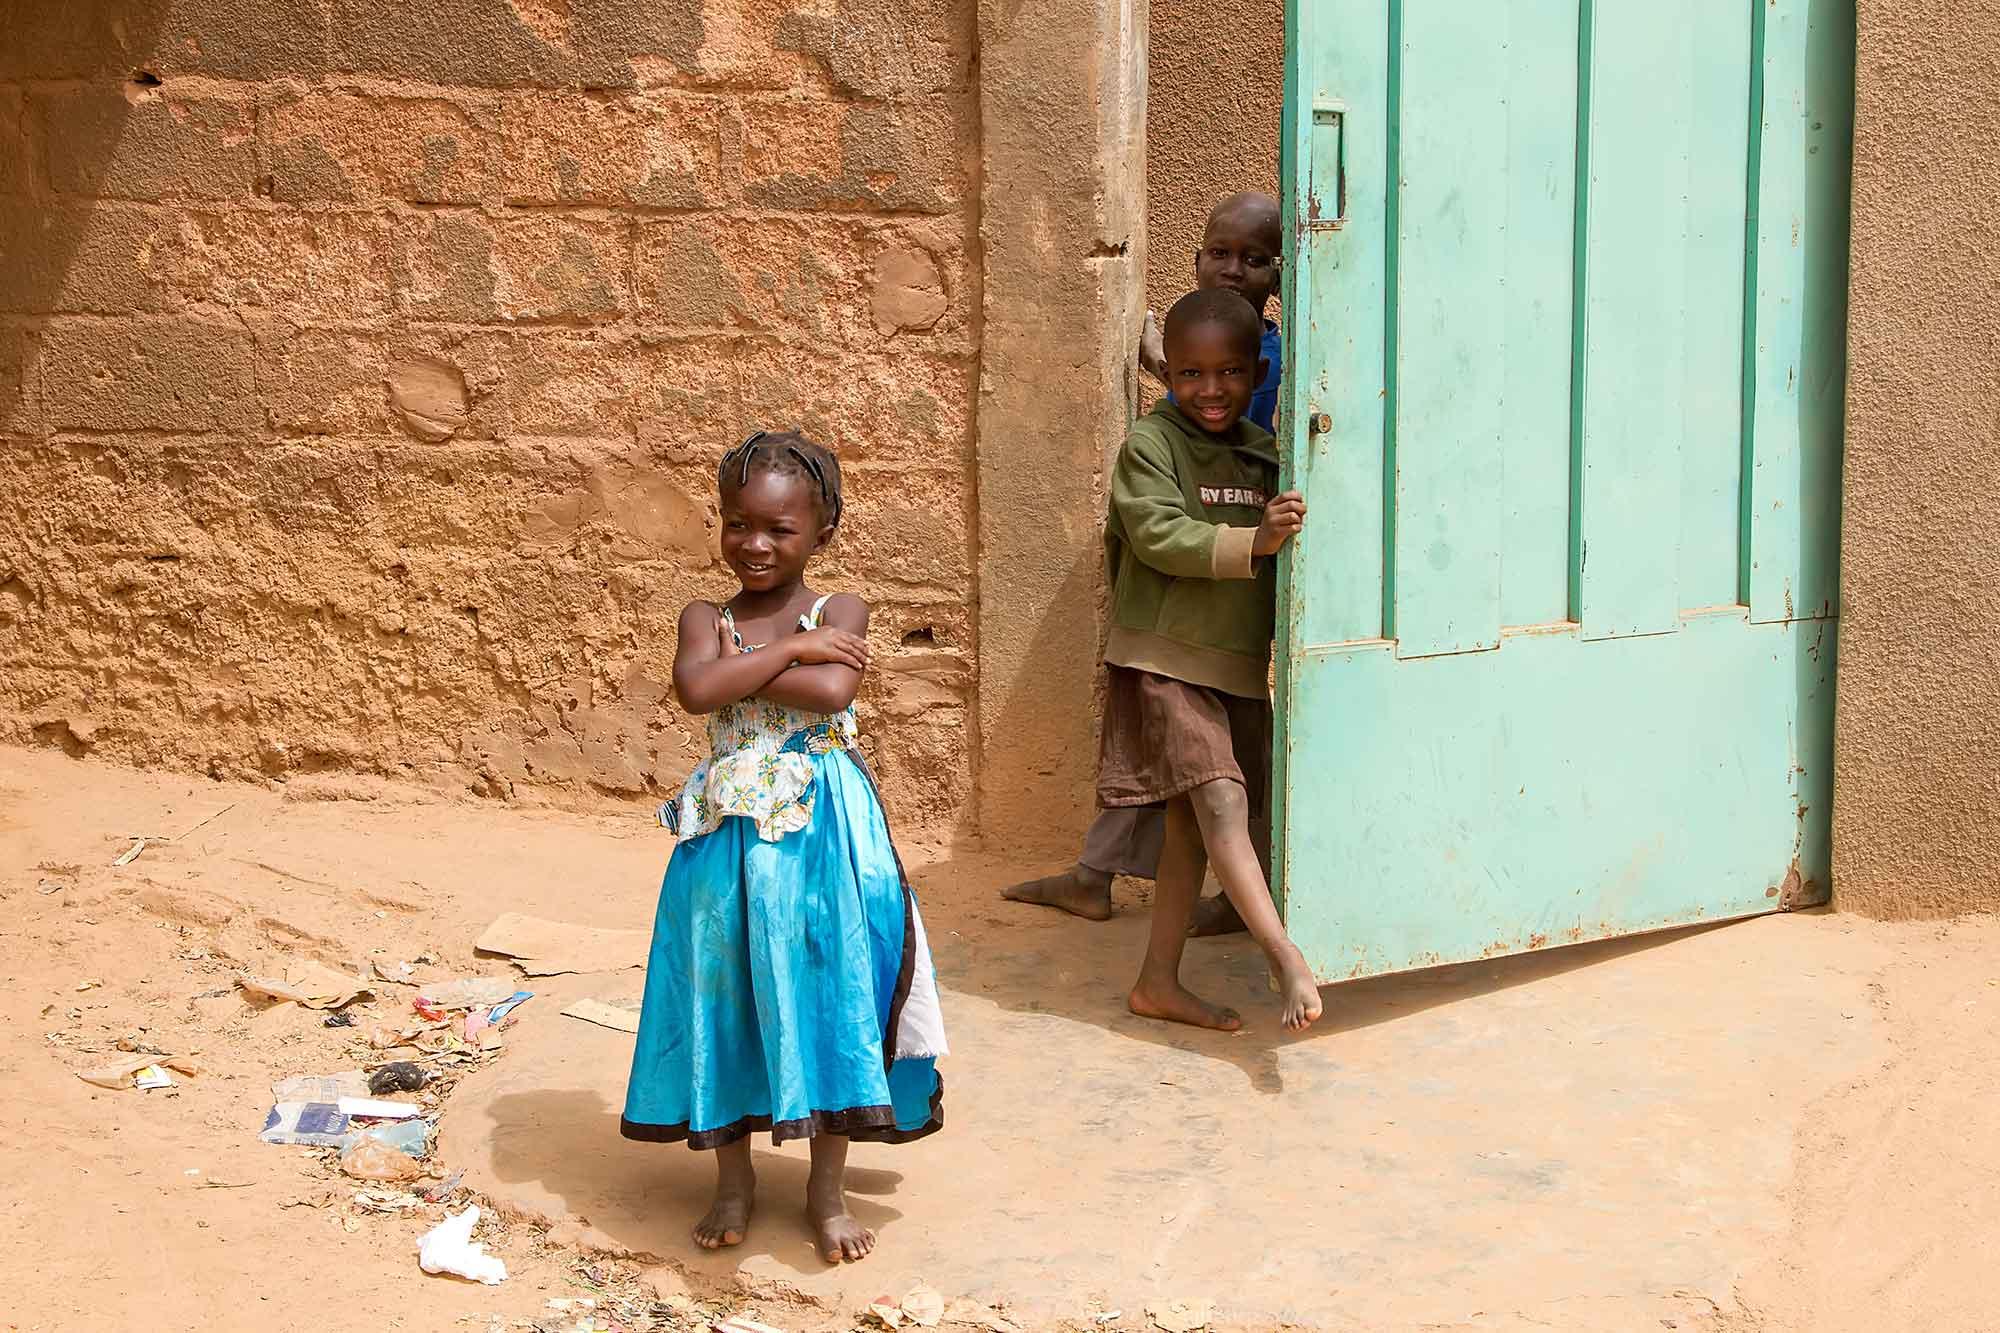 children-playing-in-ougadougou-burkina-faso-africa